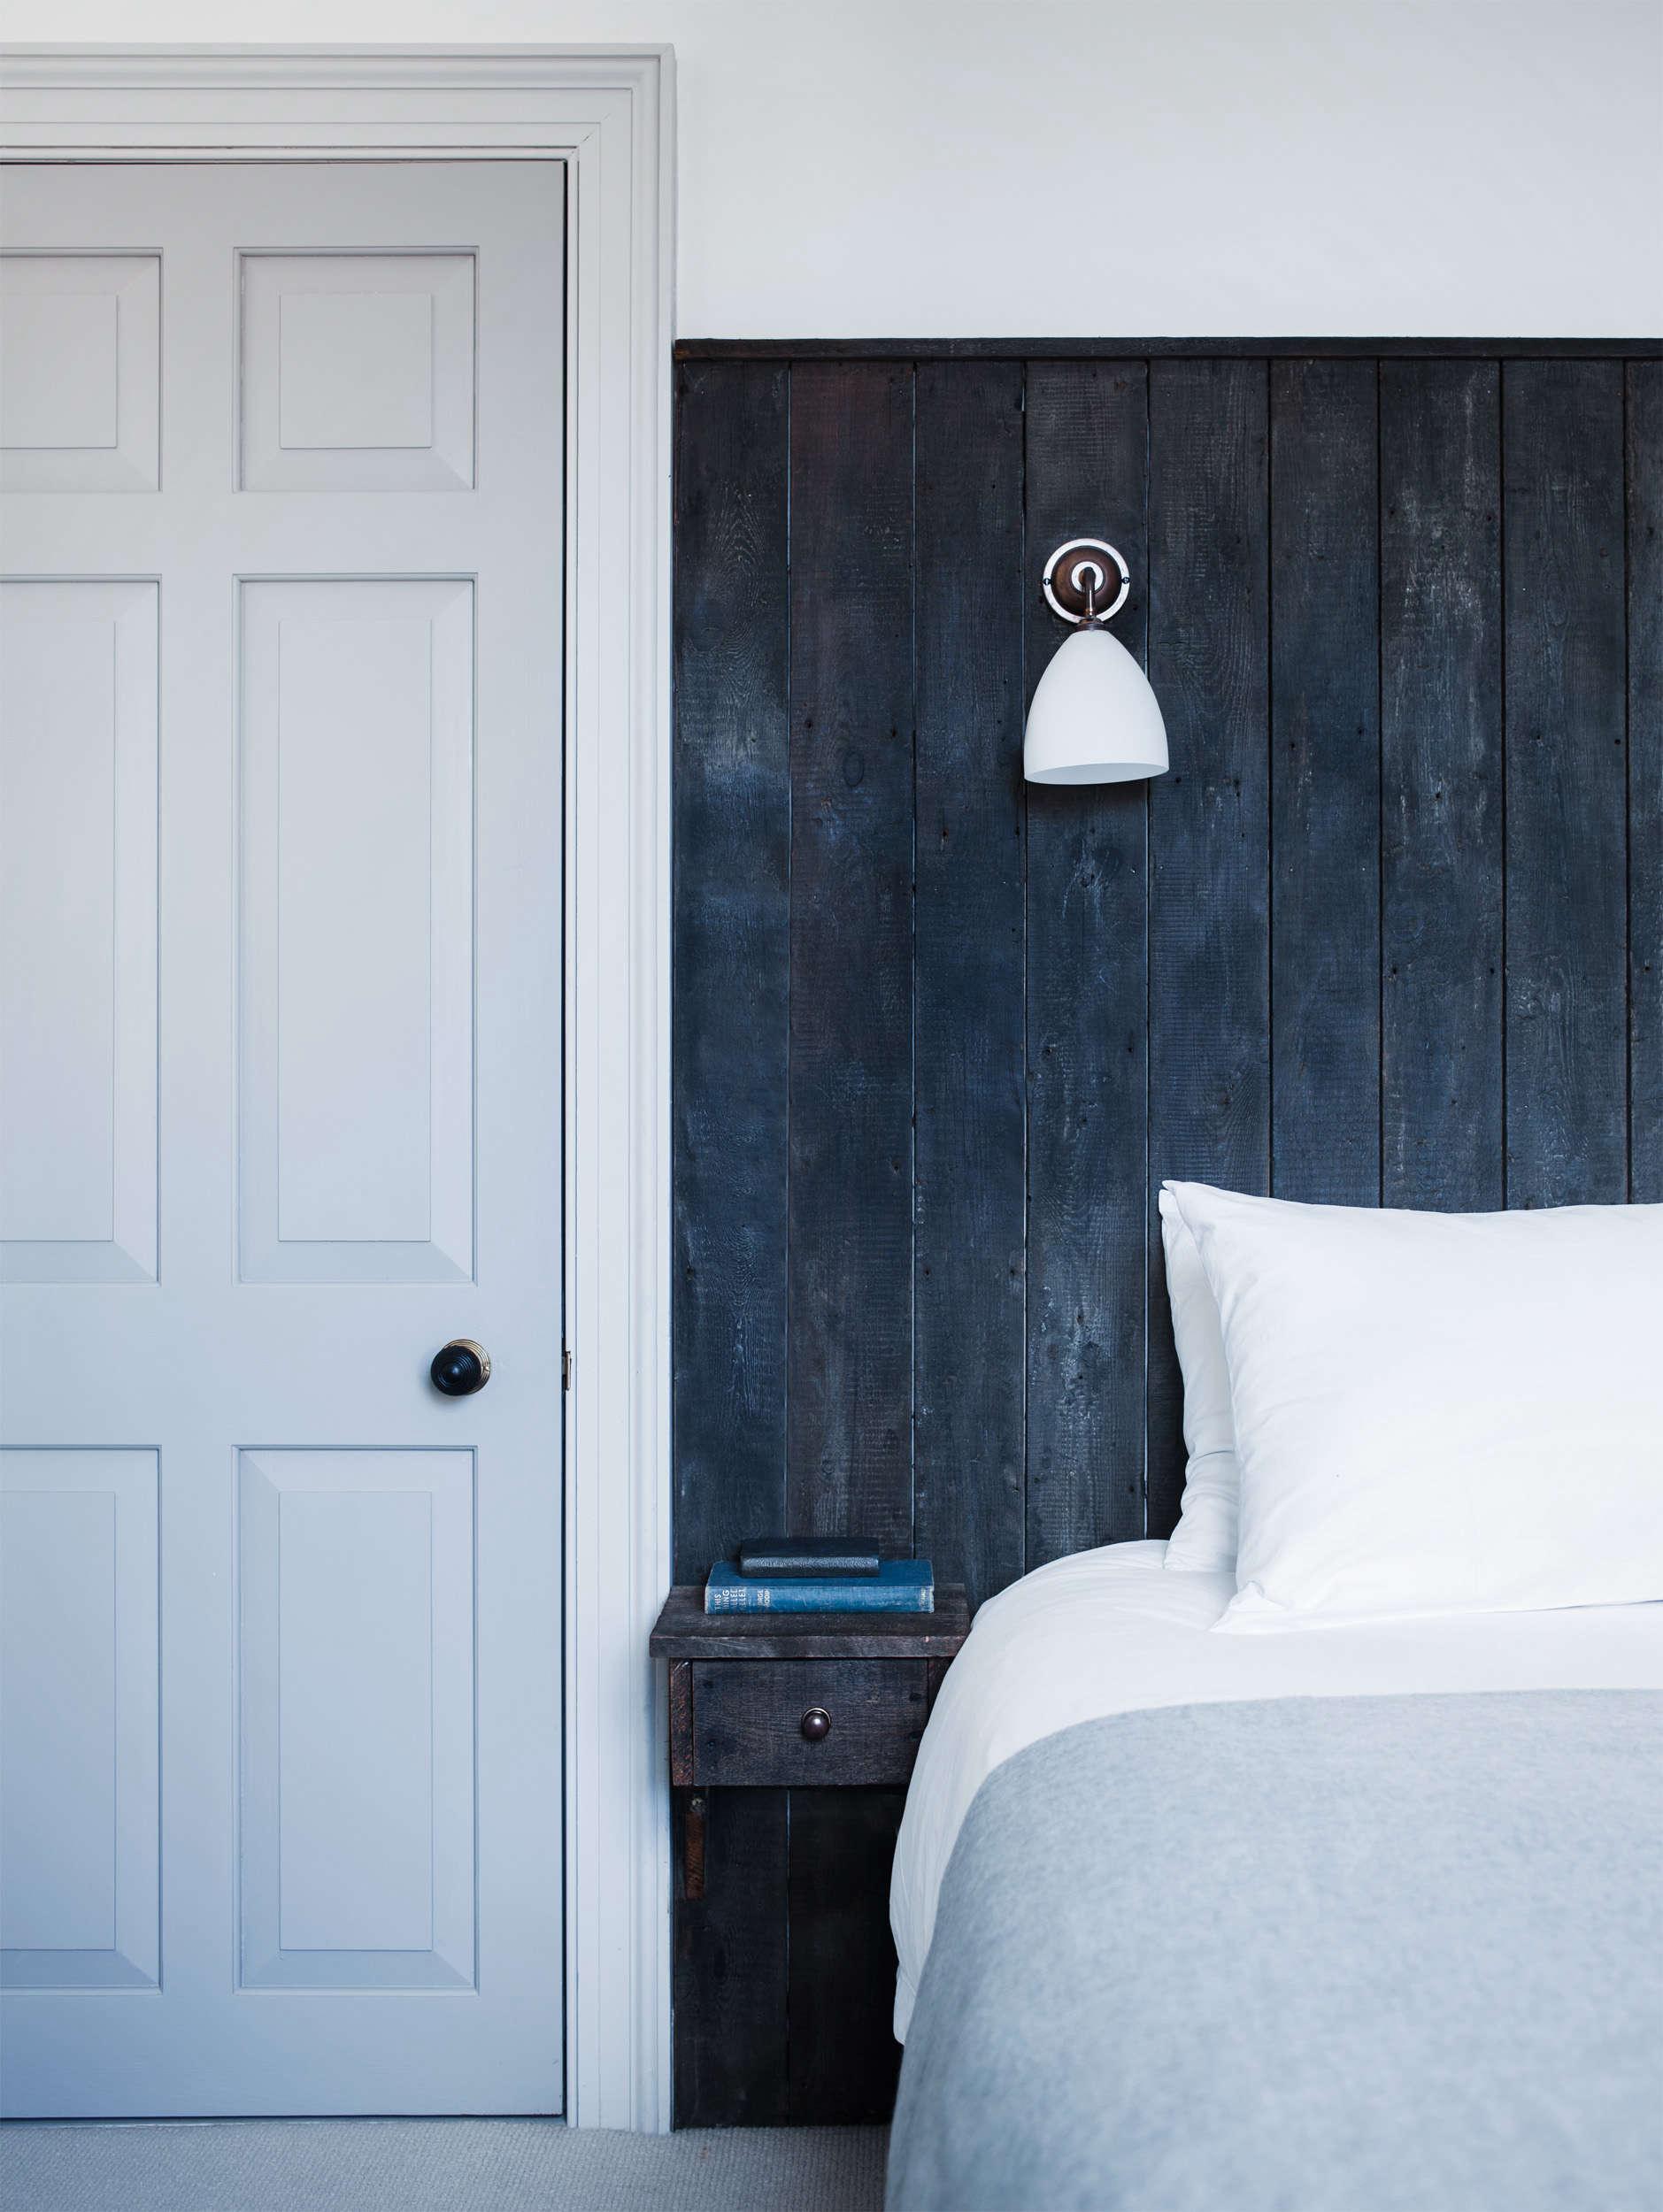 Dark Headboard in Blue Dorset House by Mark Lewis, Photo by Rory Gardiner